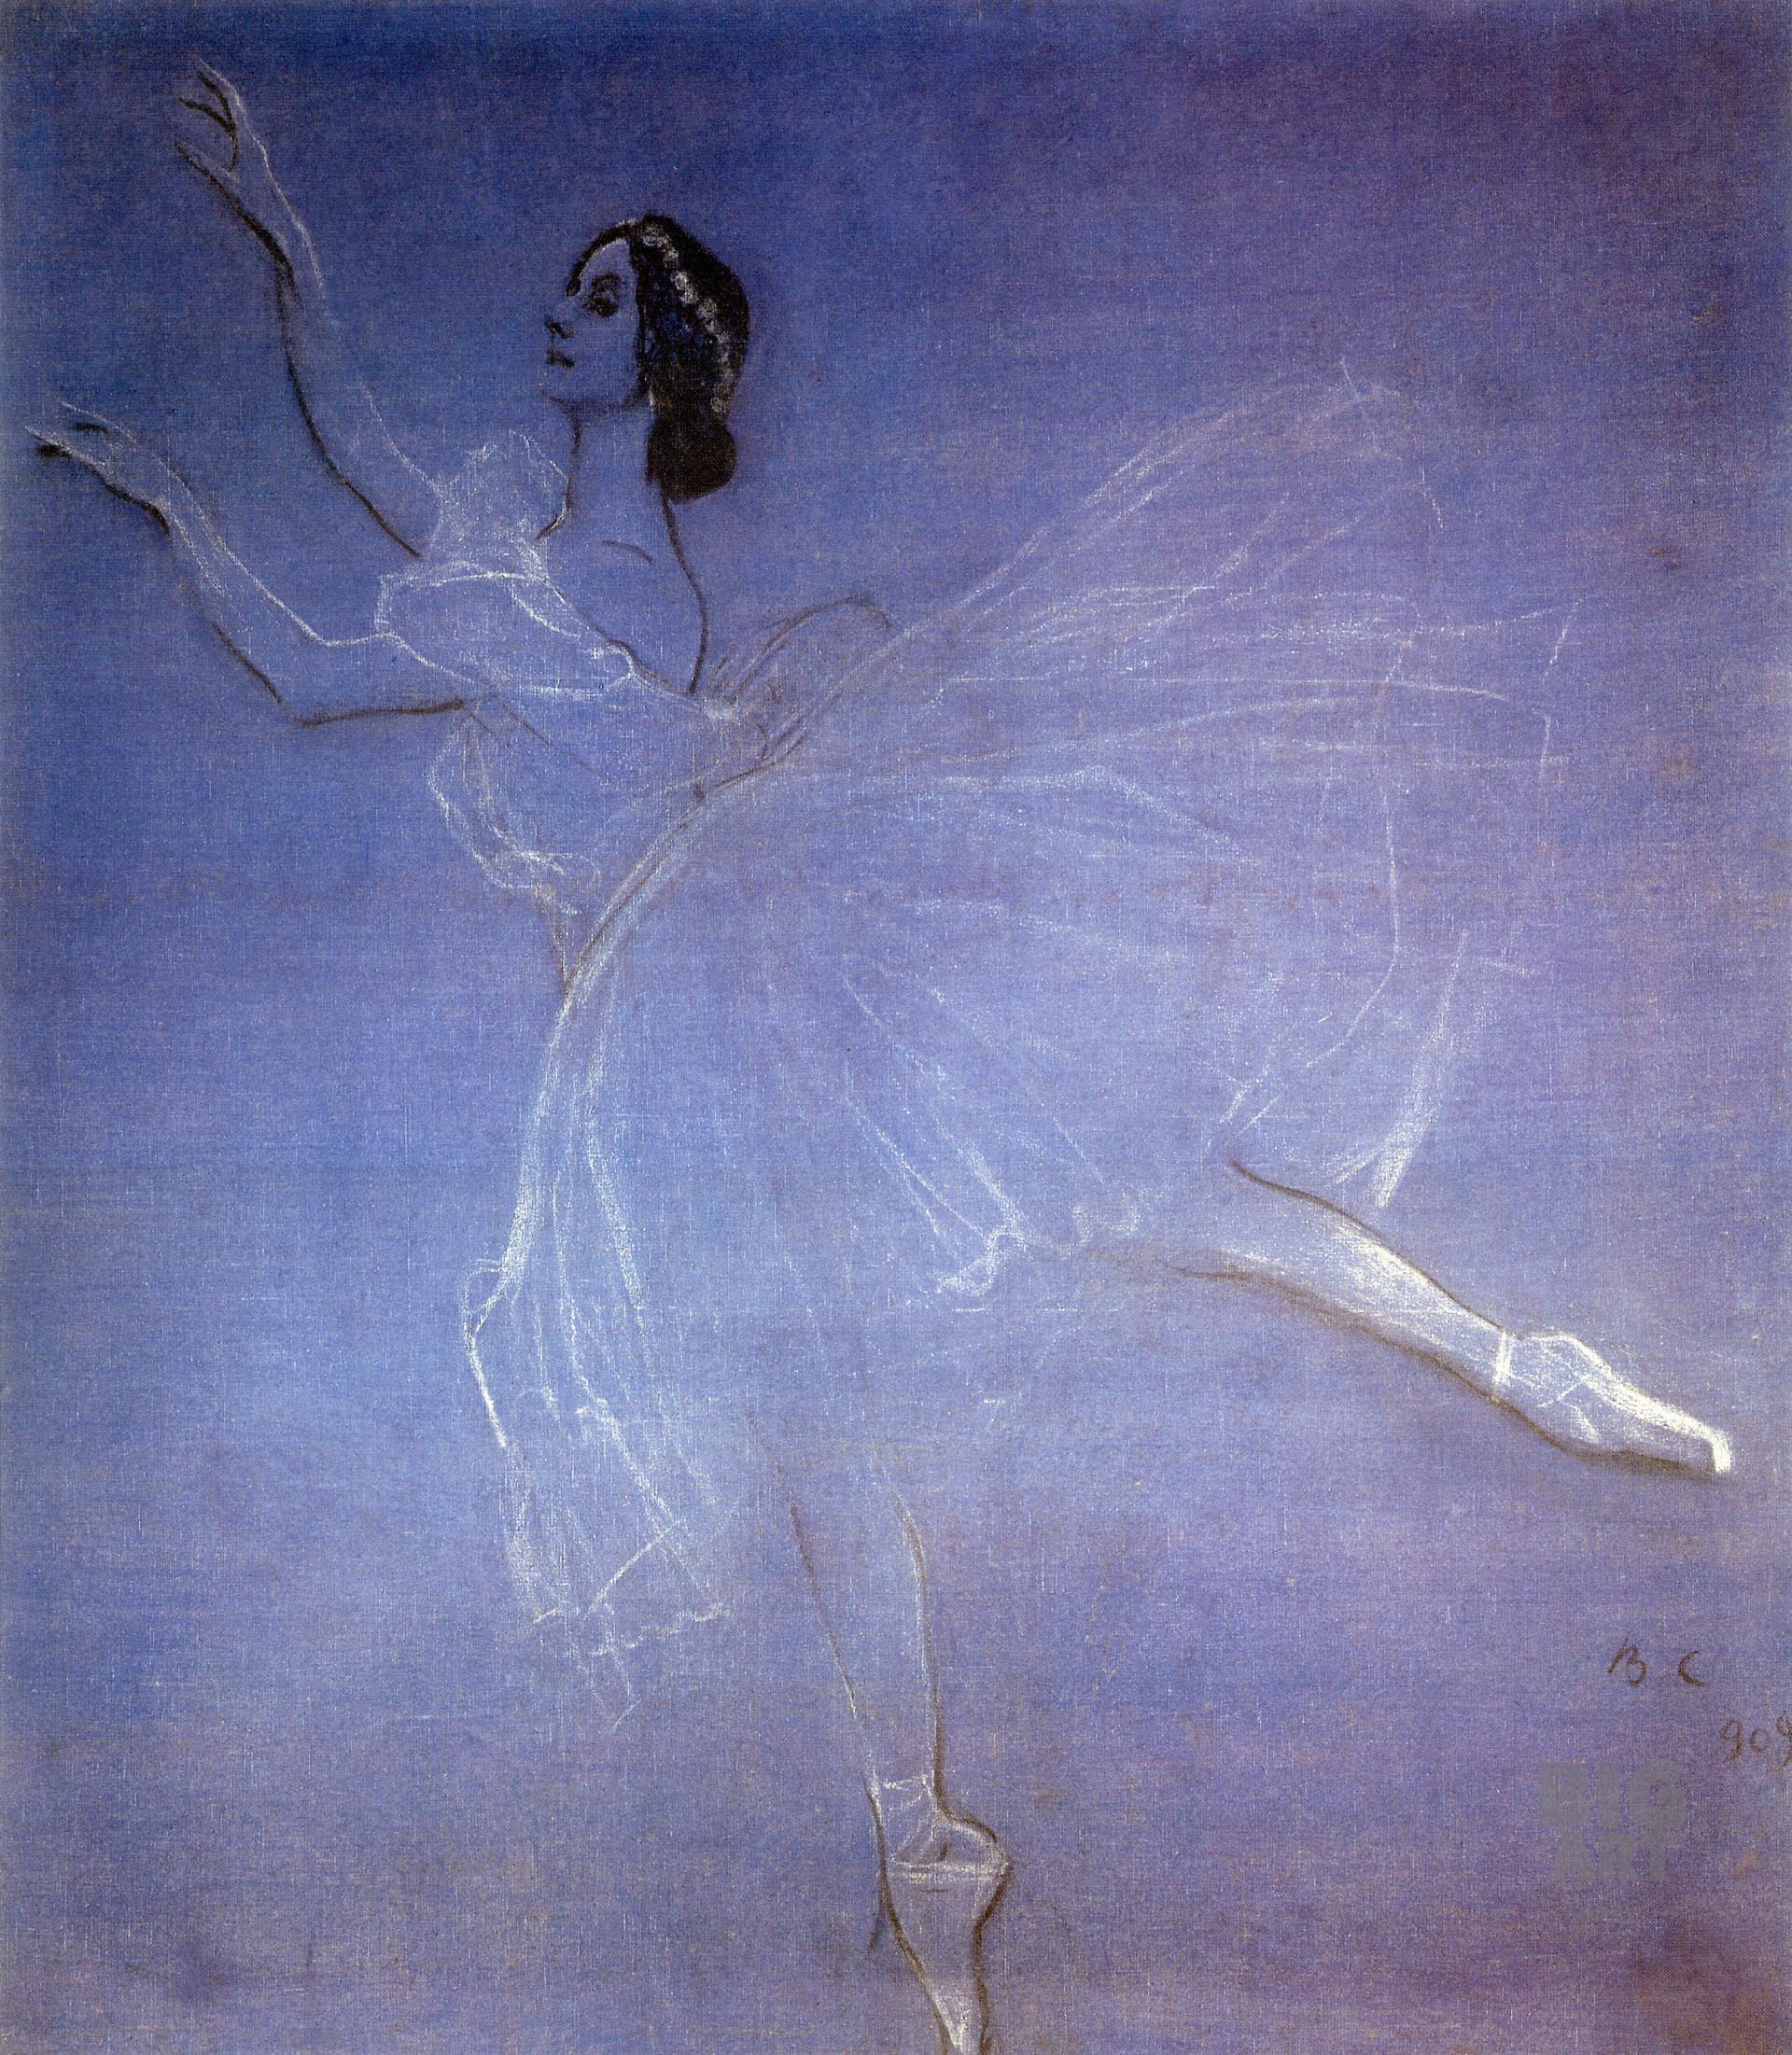 Valentin Serov. Anna Pavlova dans le ballet La Sylphide, 1909